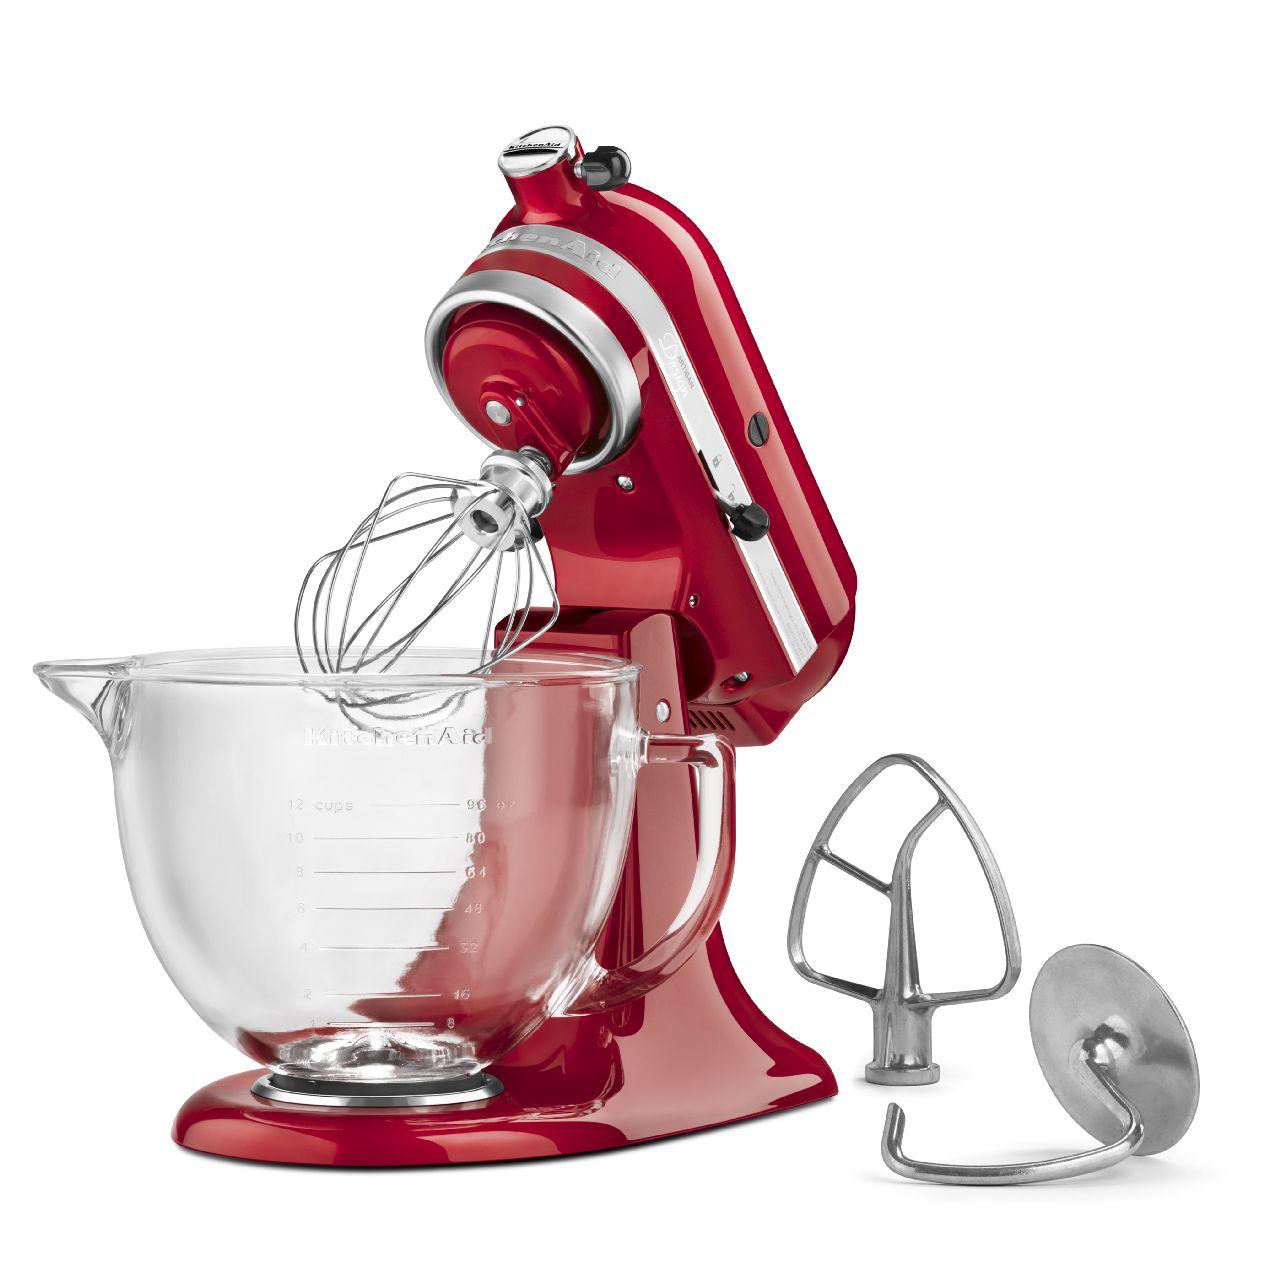 KitchenAid 5 Quart Artisan Stand Mixer Design Series Glass Bowl Candy Apple R